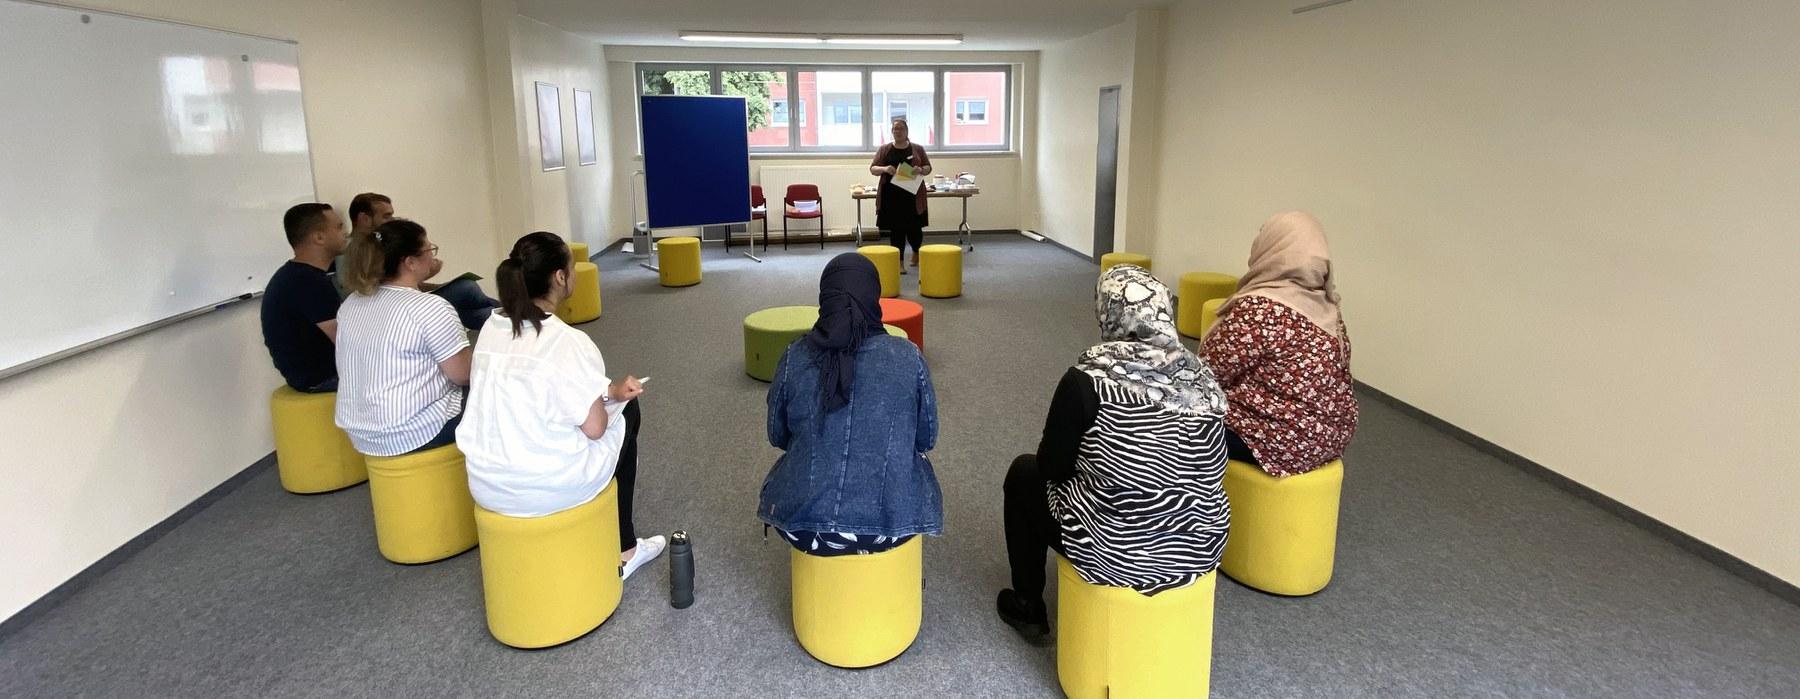 Sprach-Coaching Foto 2